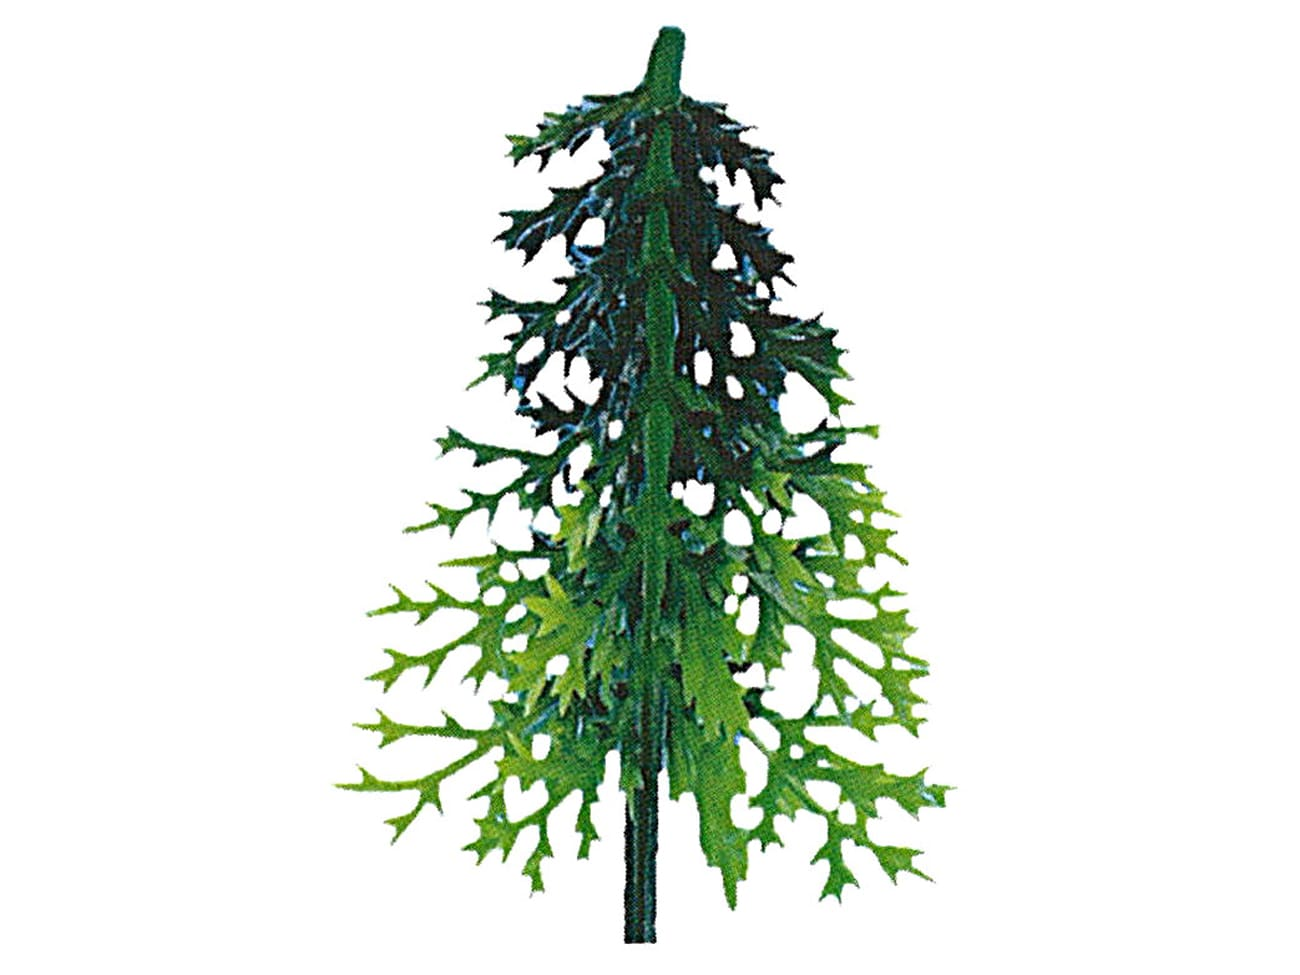 Green Christmas Tree Decorations X 100 Mallard Ferriere Meilleur Du Chef